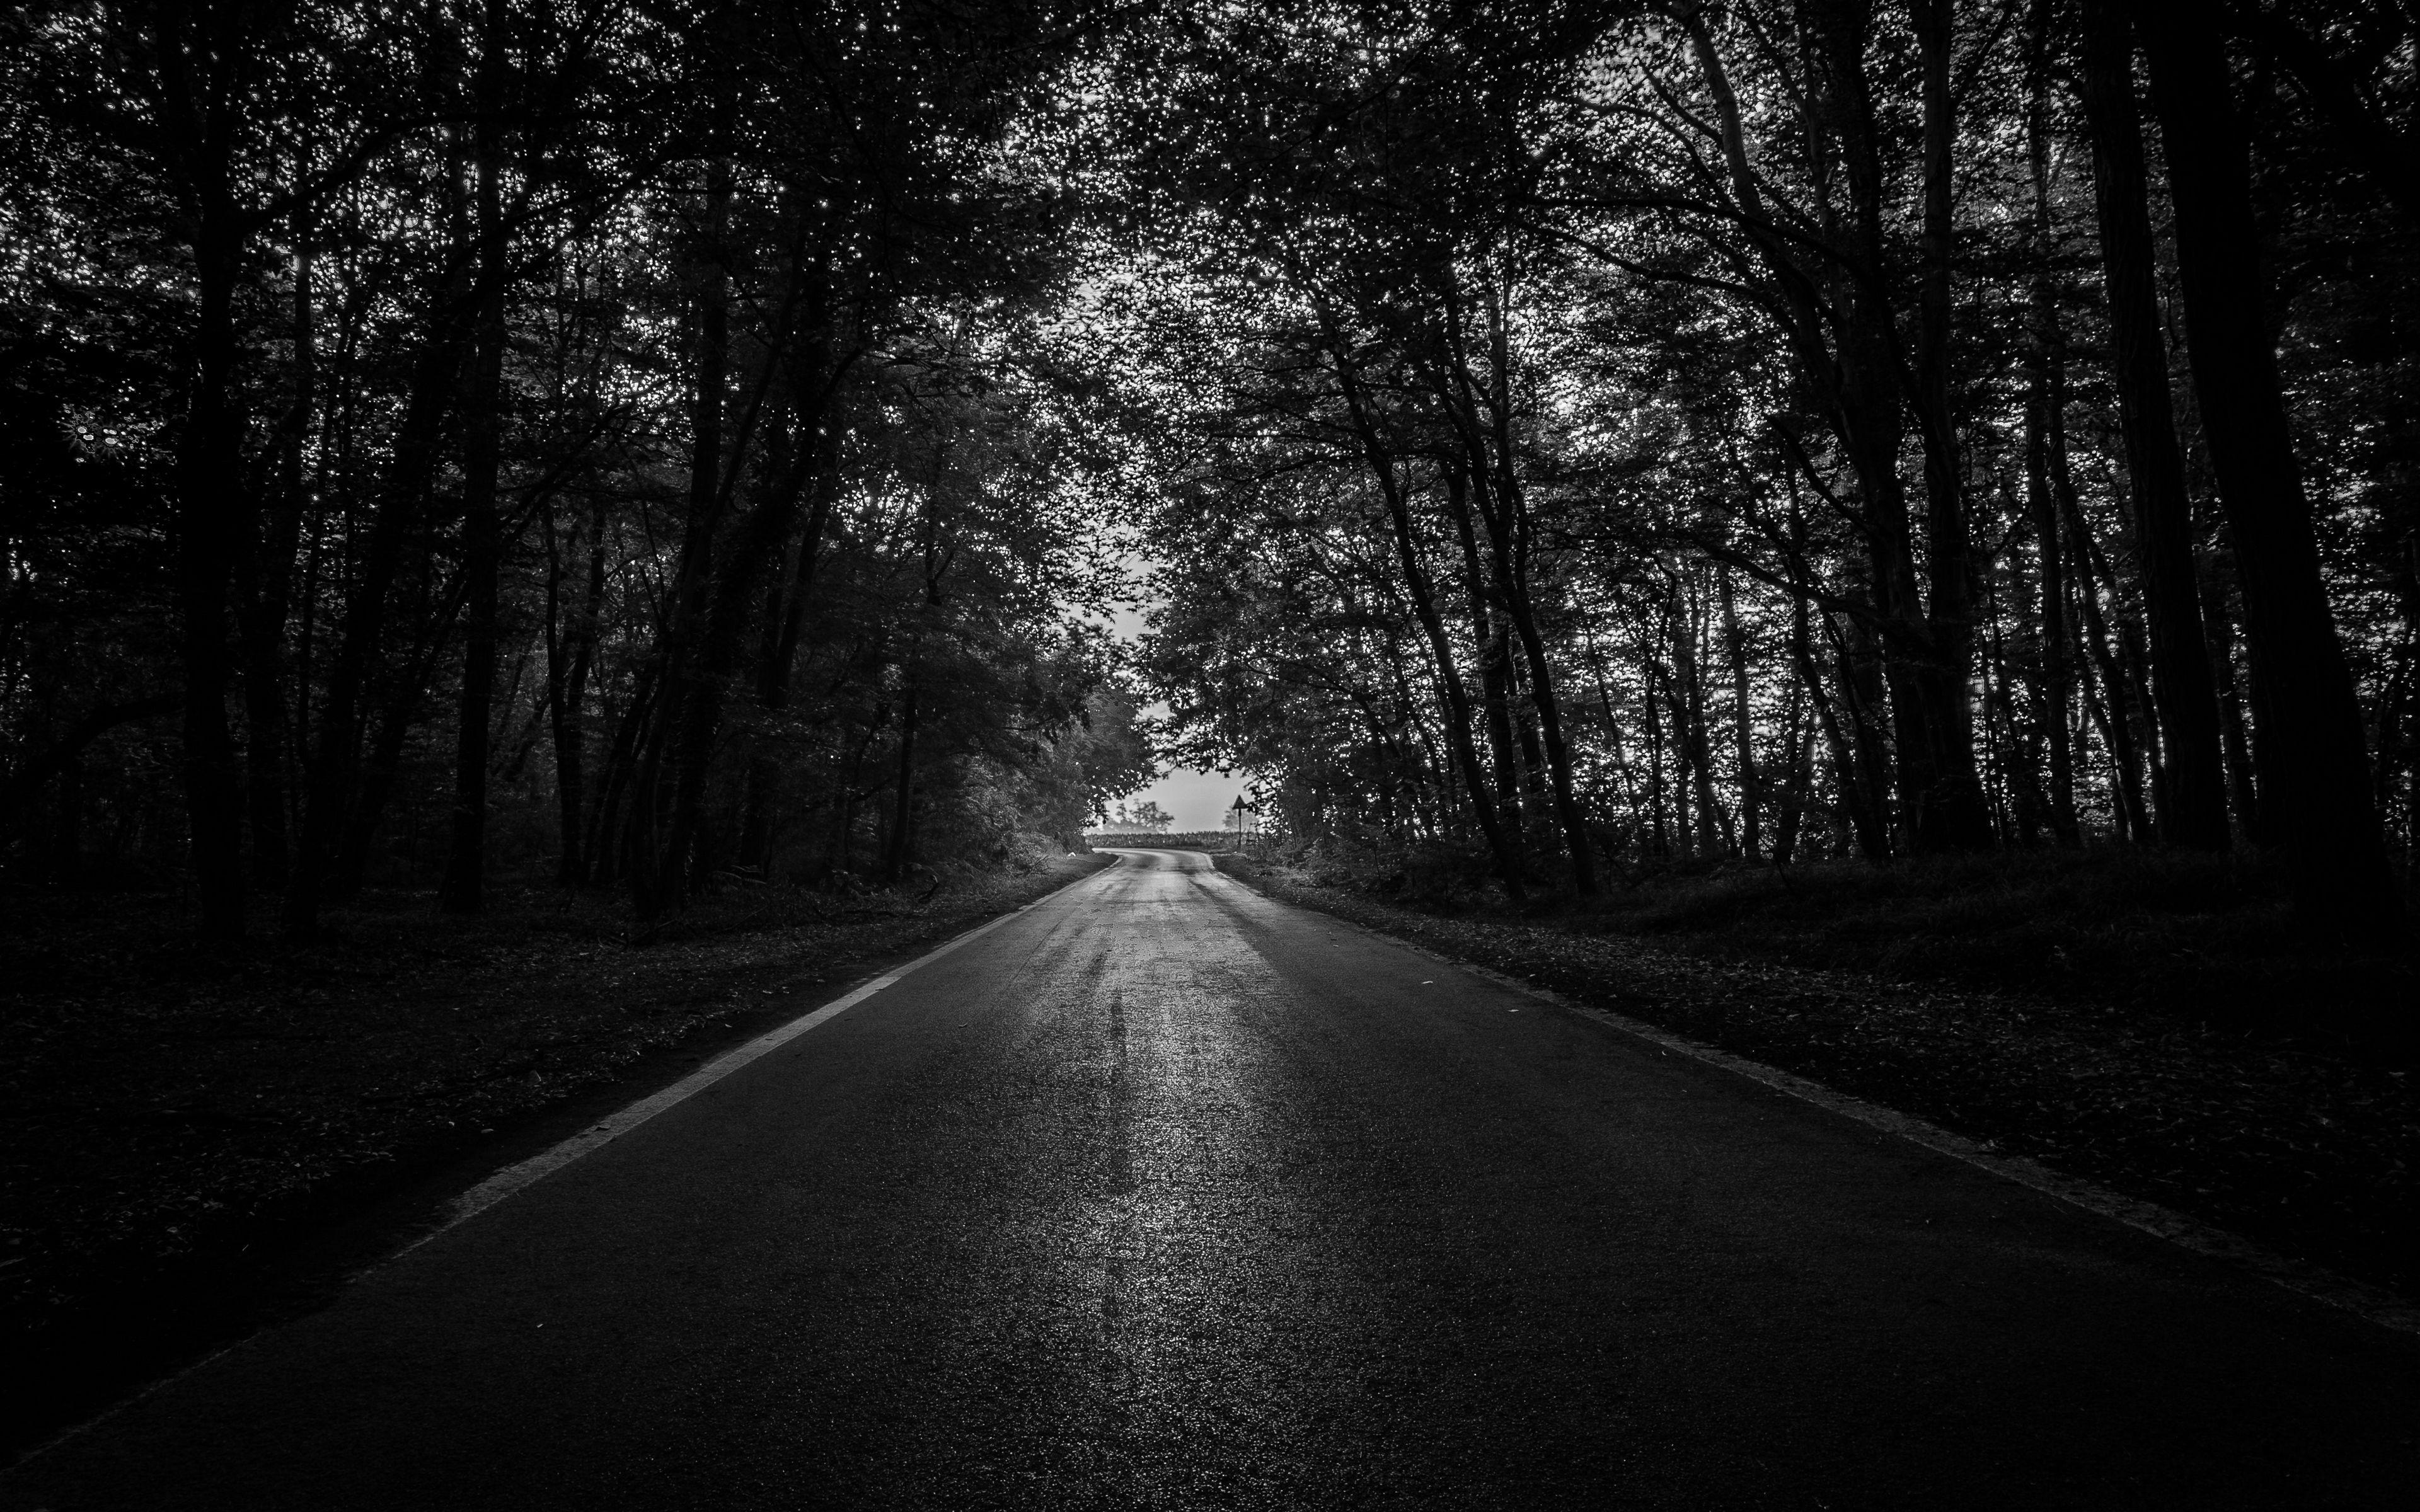 Dark Forest 4K Ultra HD Wallpapers - Top Free Dark Forest ...